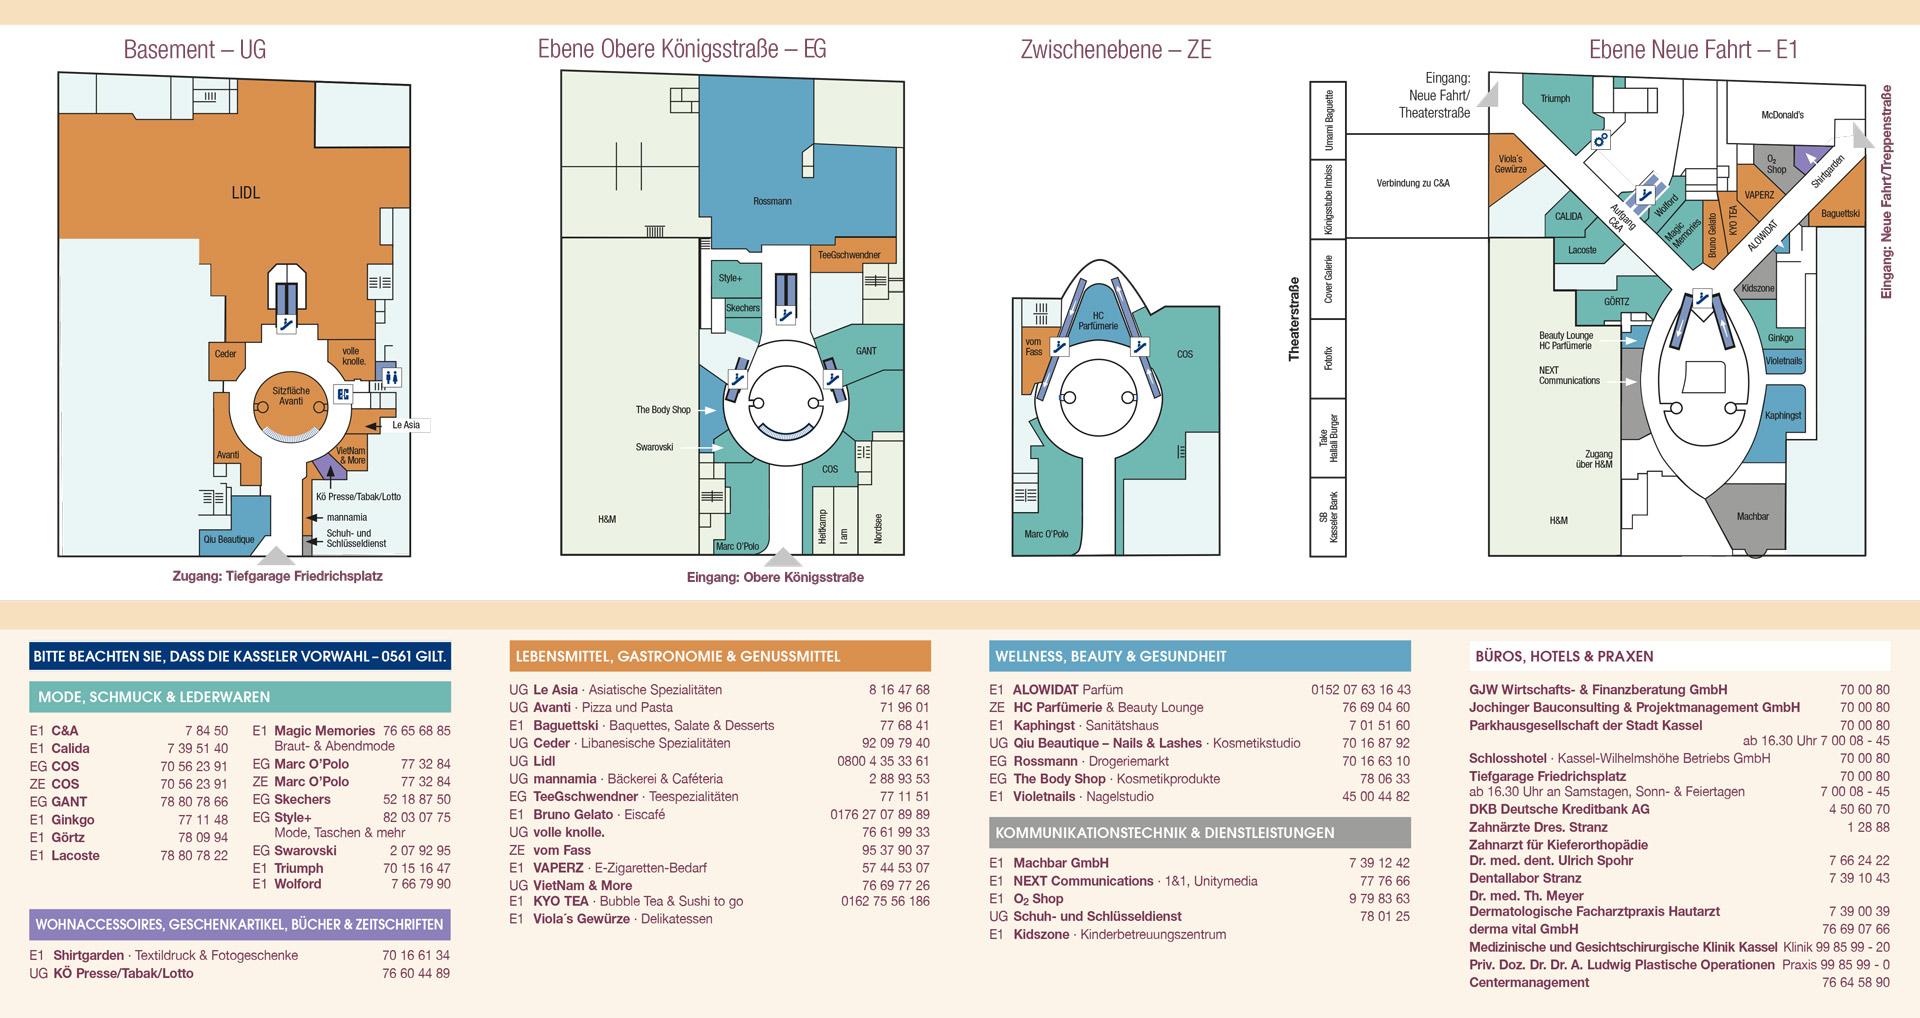 Königs-Galerie Centerplan